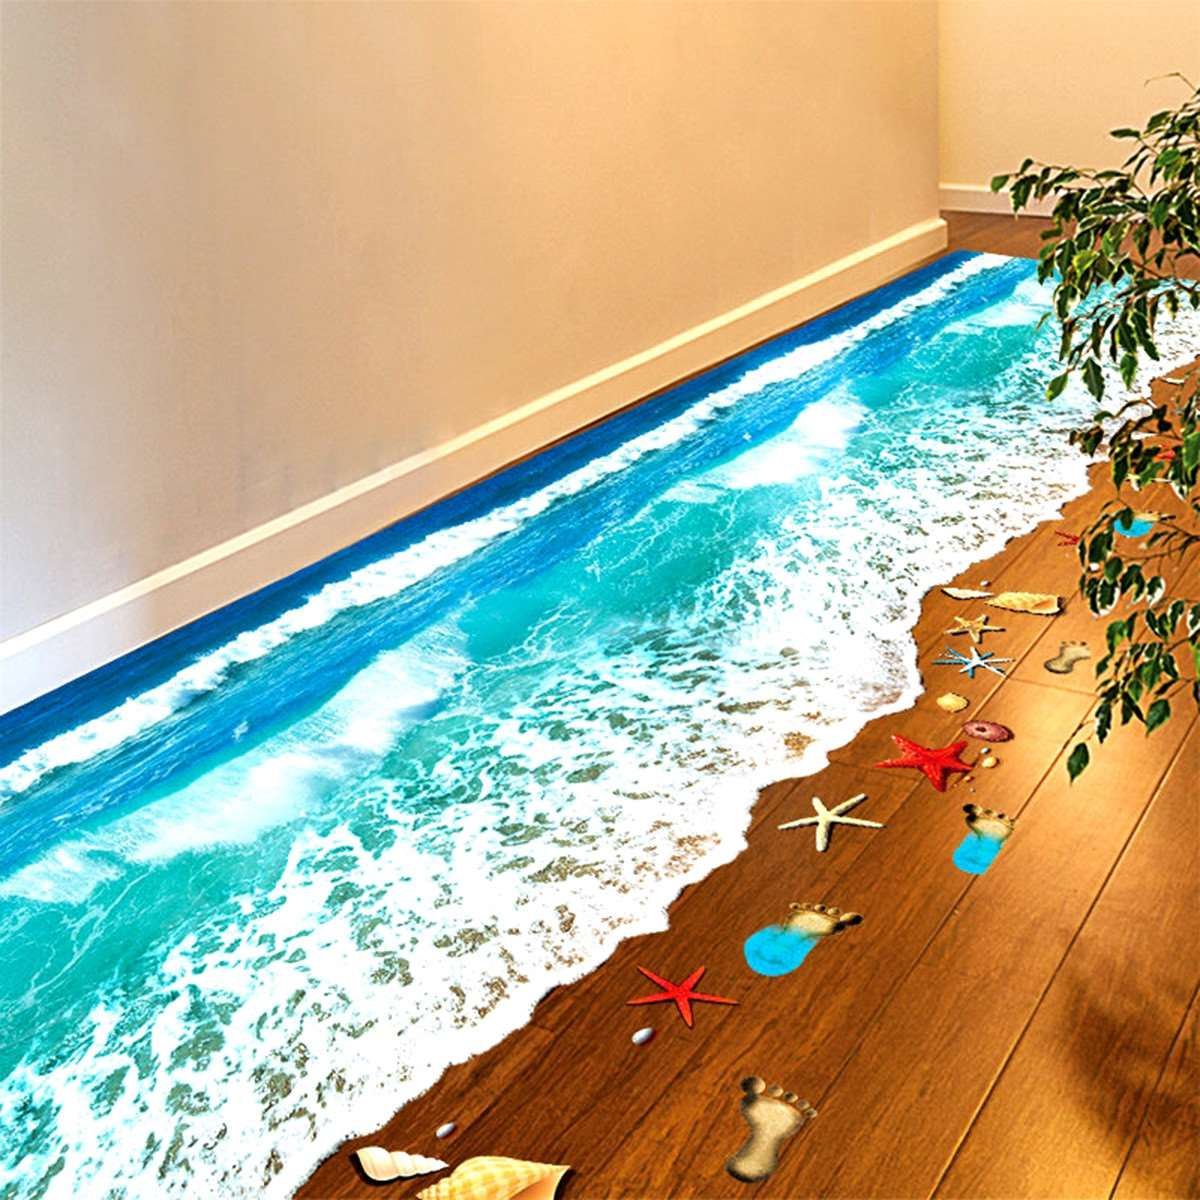 Spiaggia di sabbia carta da parati recensioni acquisti for Carta da parati 3d mare